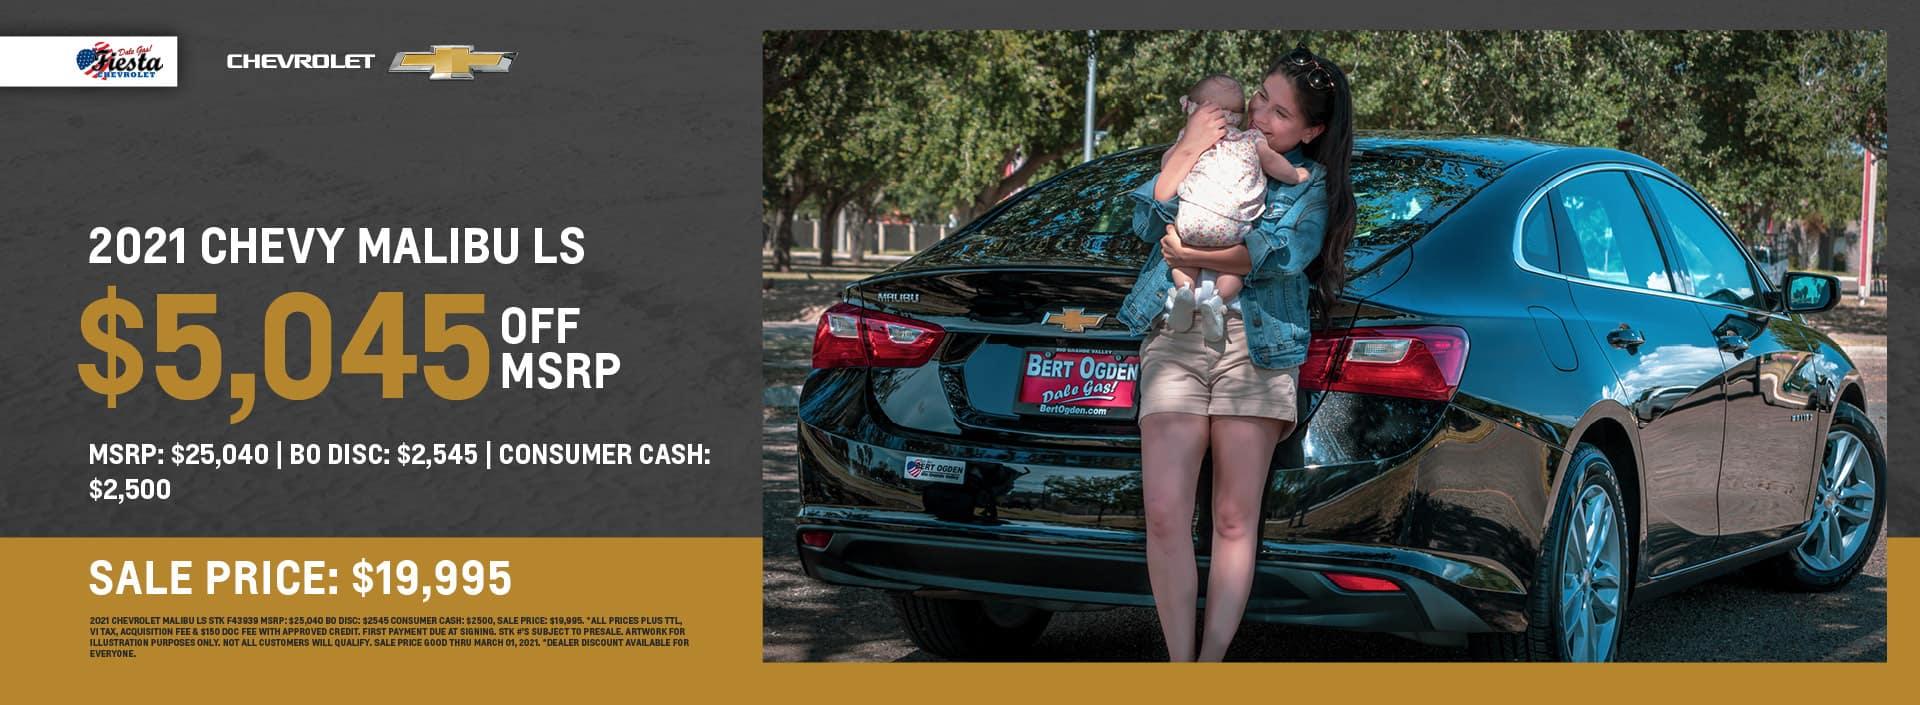 BOFiesta-Chevrolet-Specials-1920X705-2021MALIBU_LS